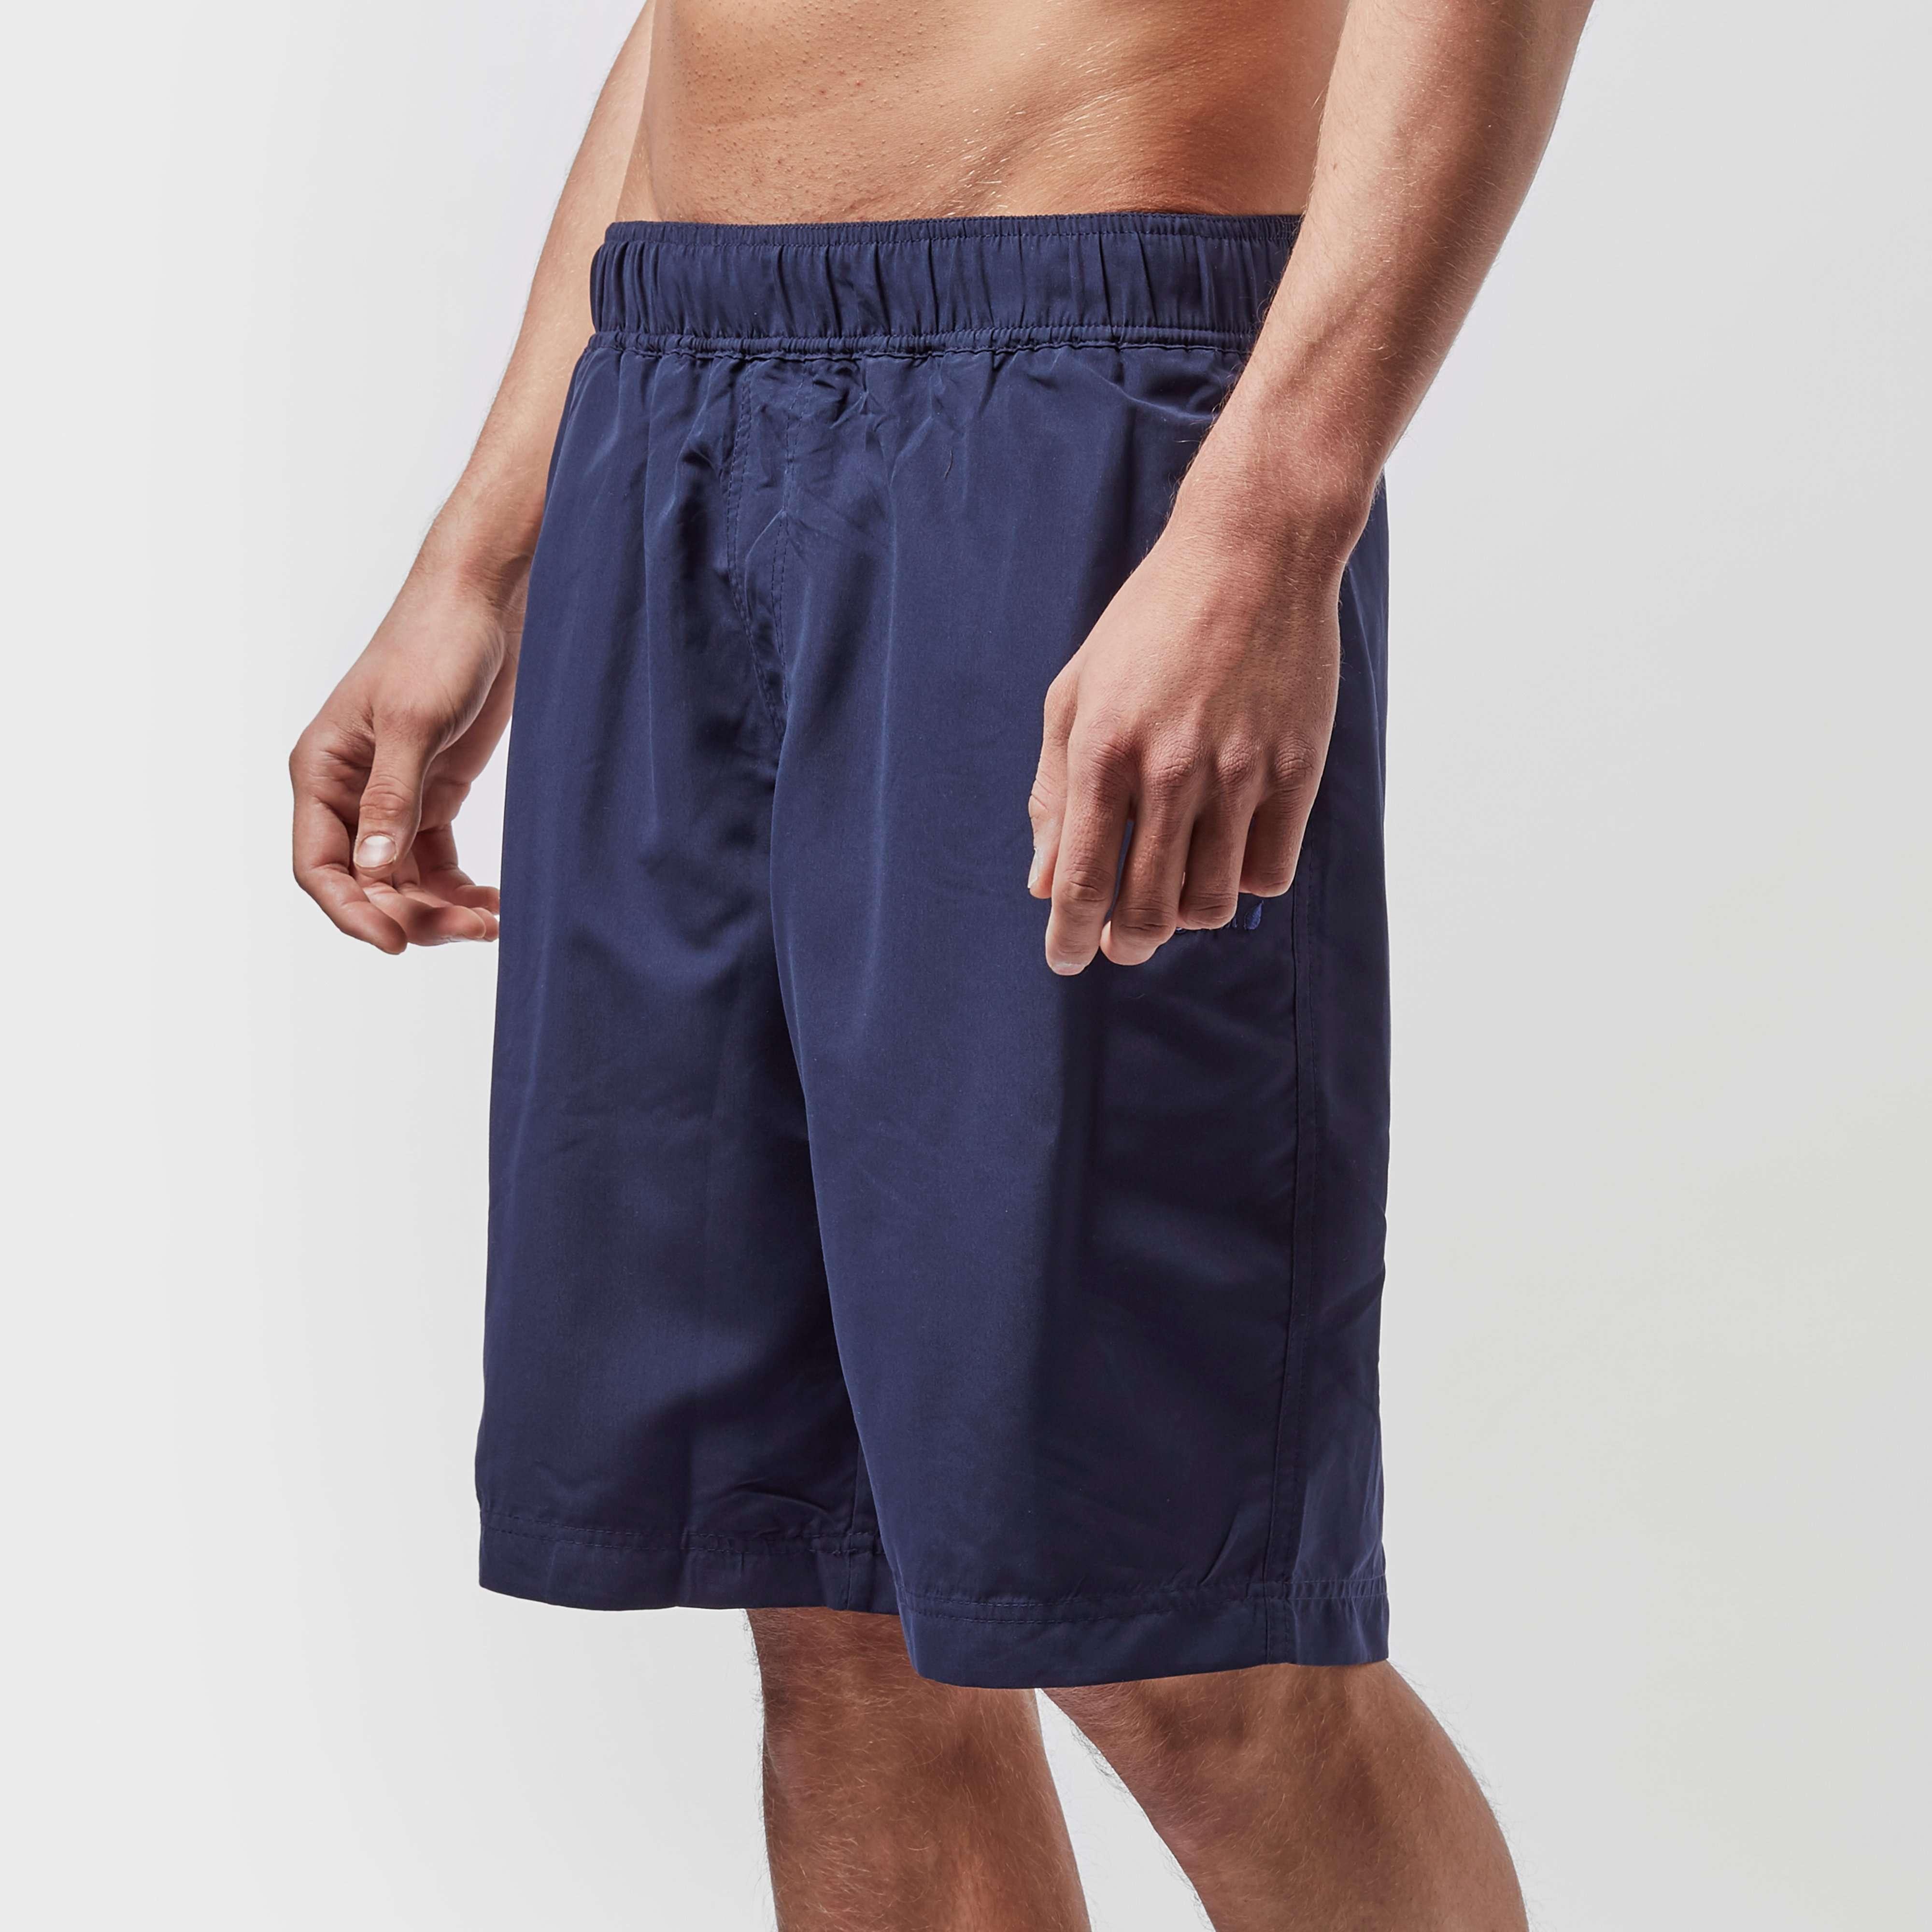 PETER STORM Men's Swim Shorts